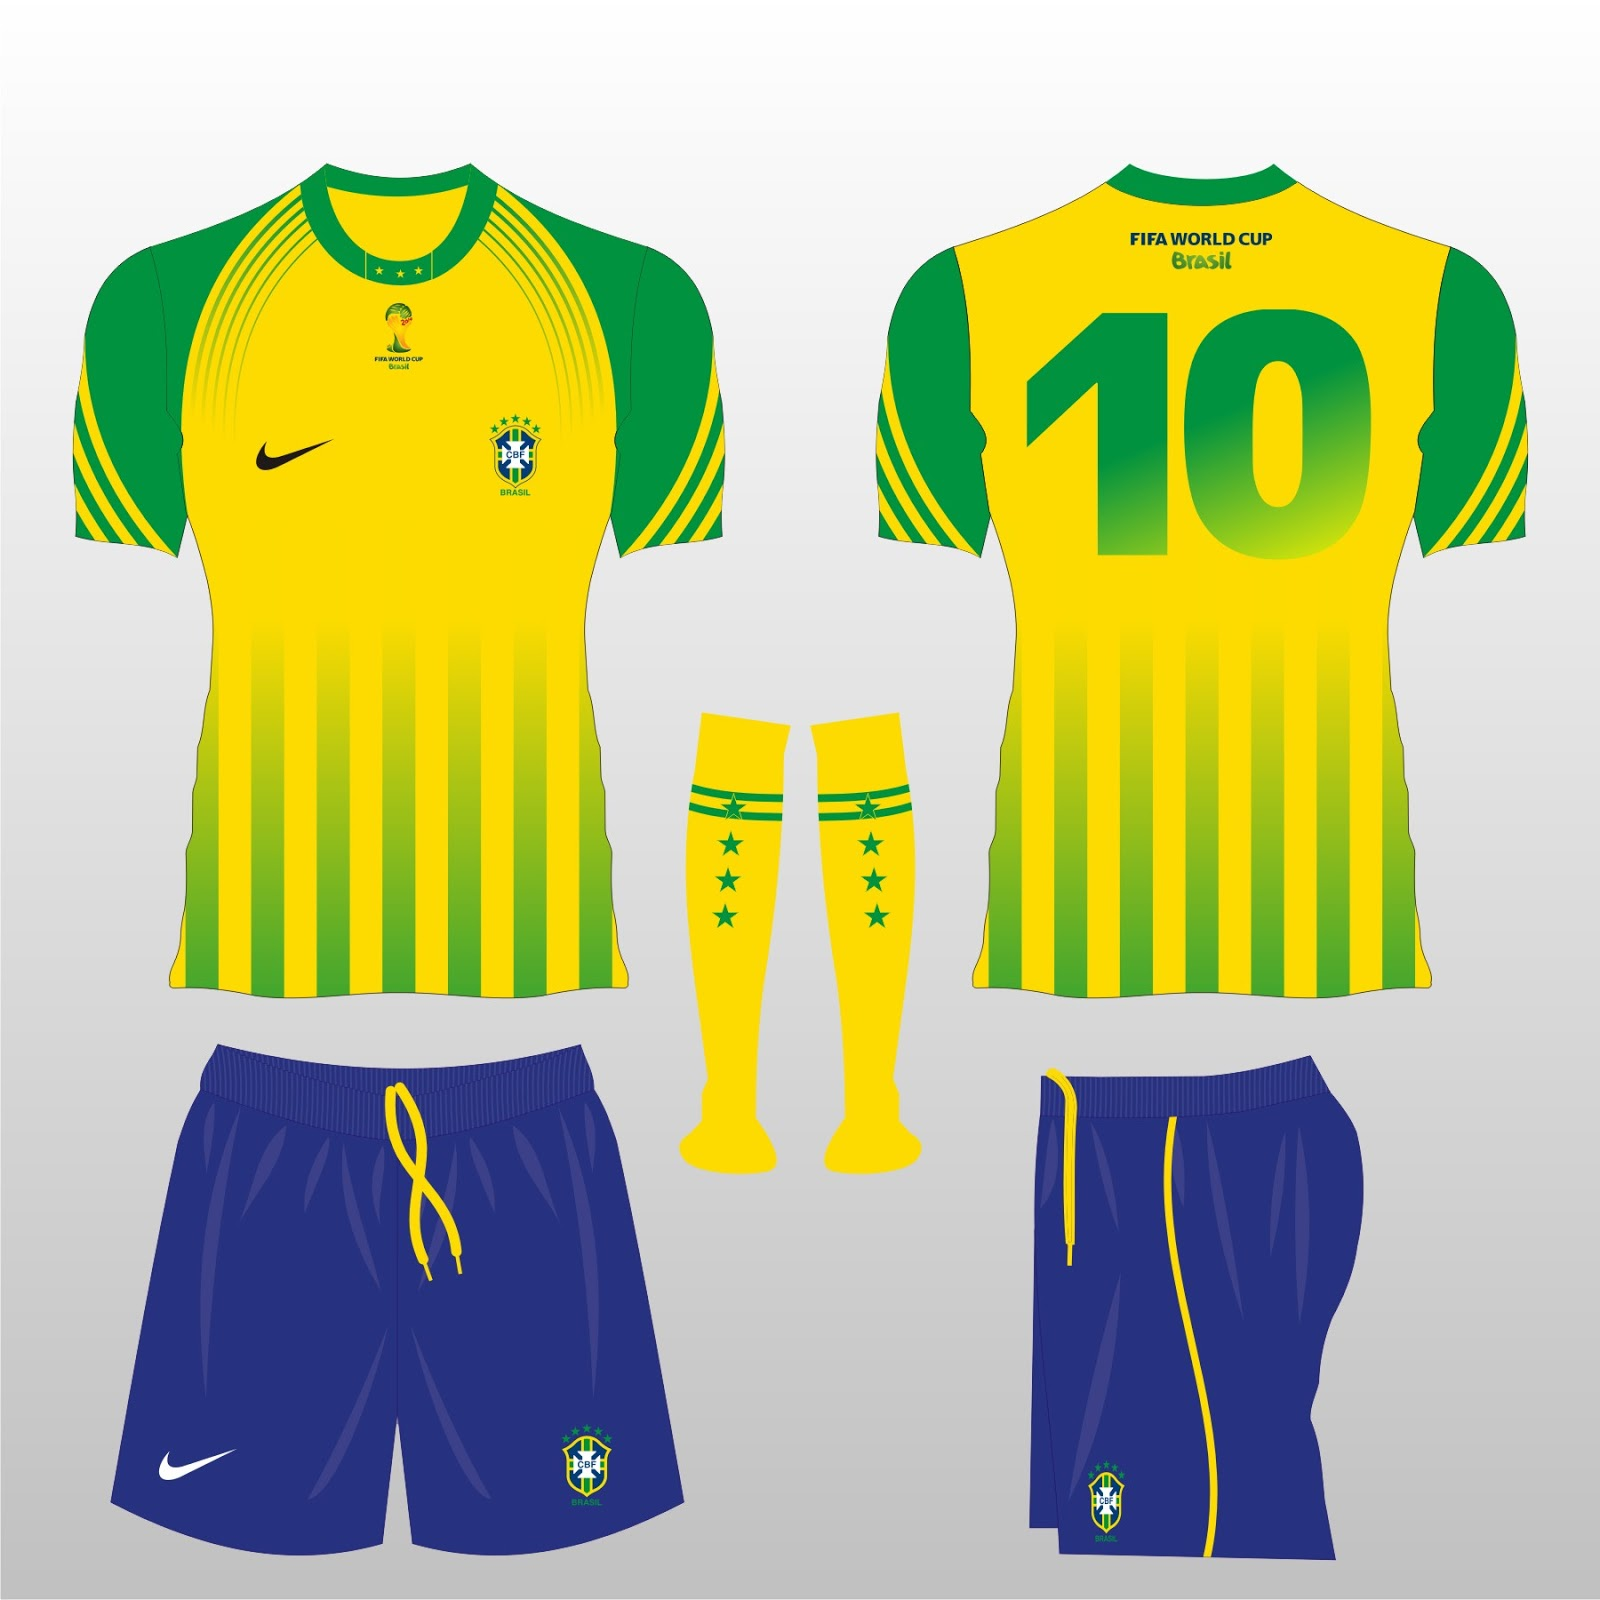 Football Kit Design Master Brasil Purposed Football Kit Design Wc2014